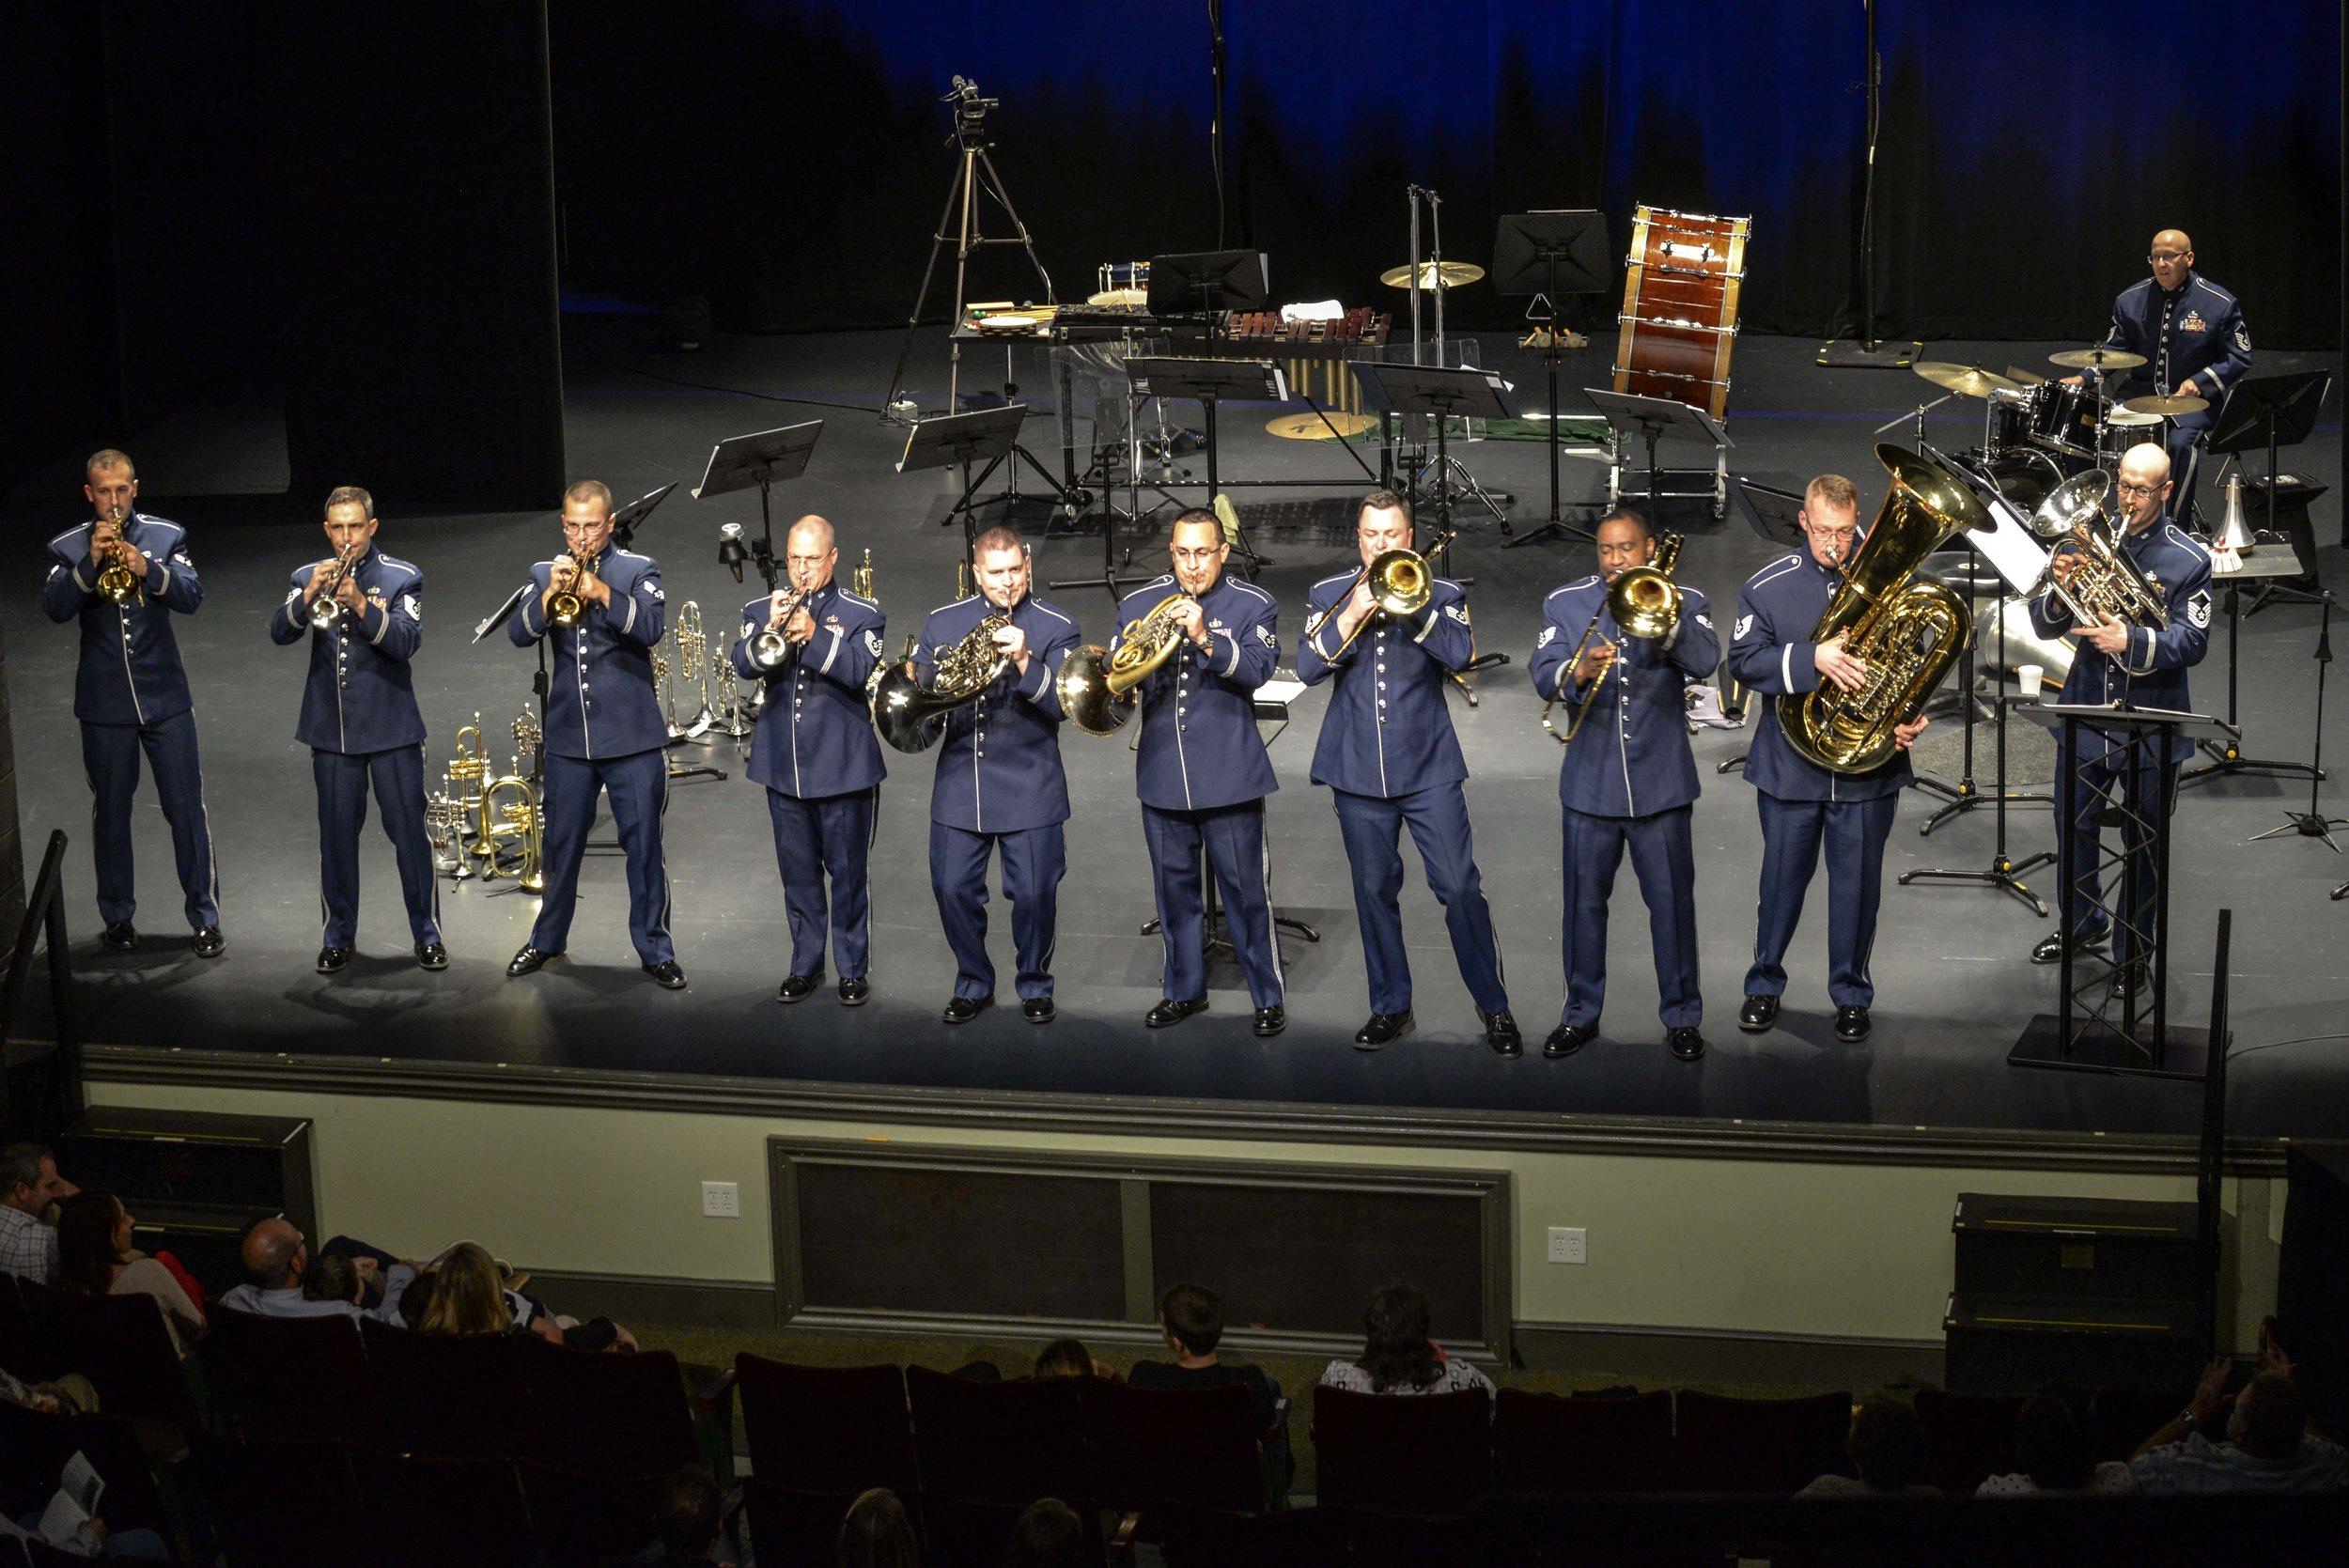 USAF HoA Band Horn Section